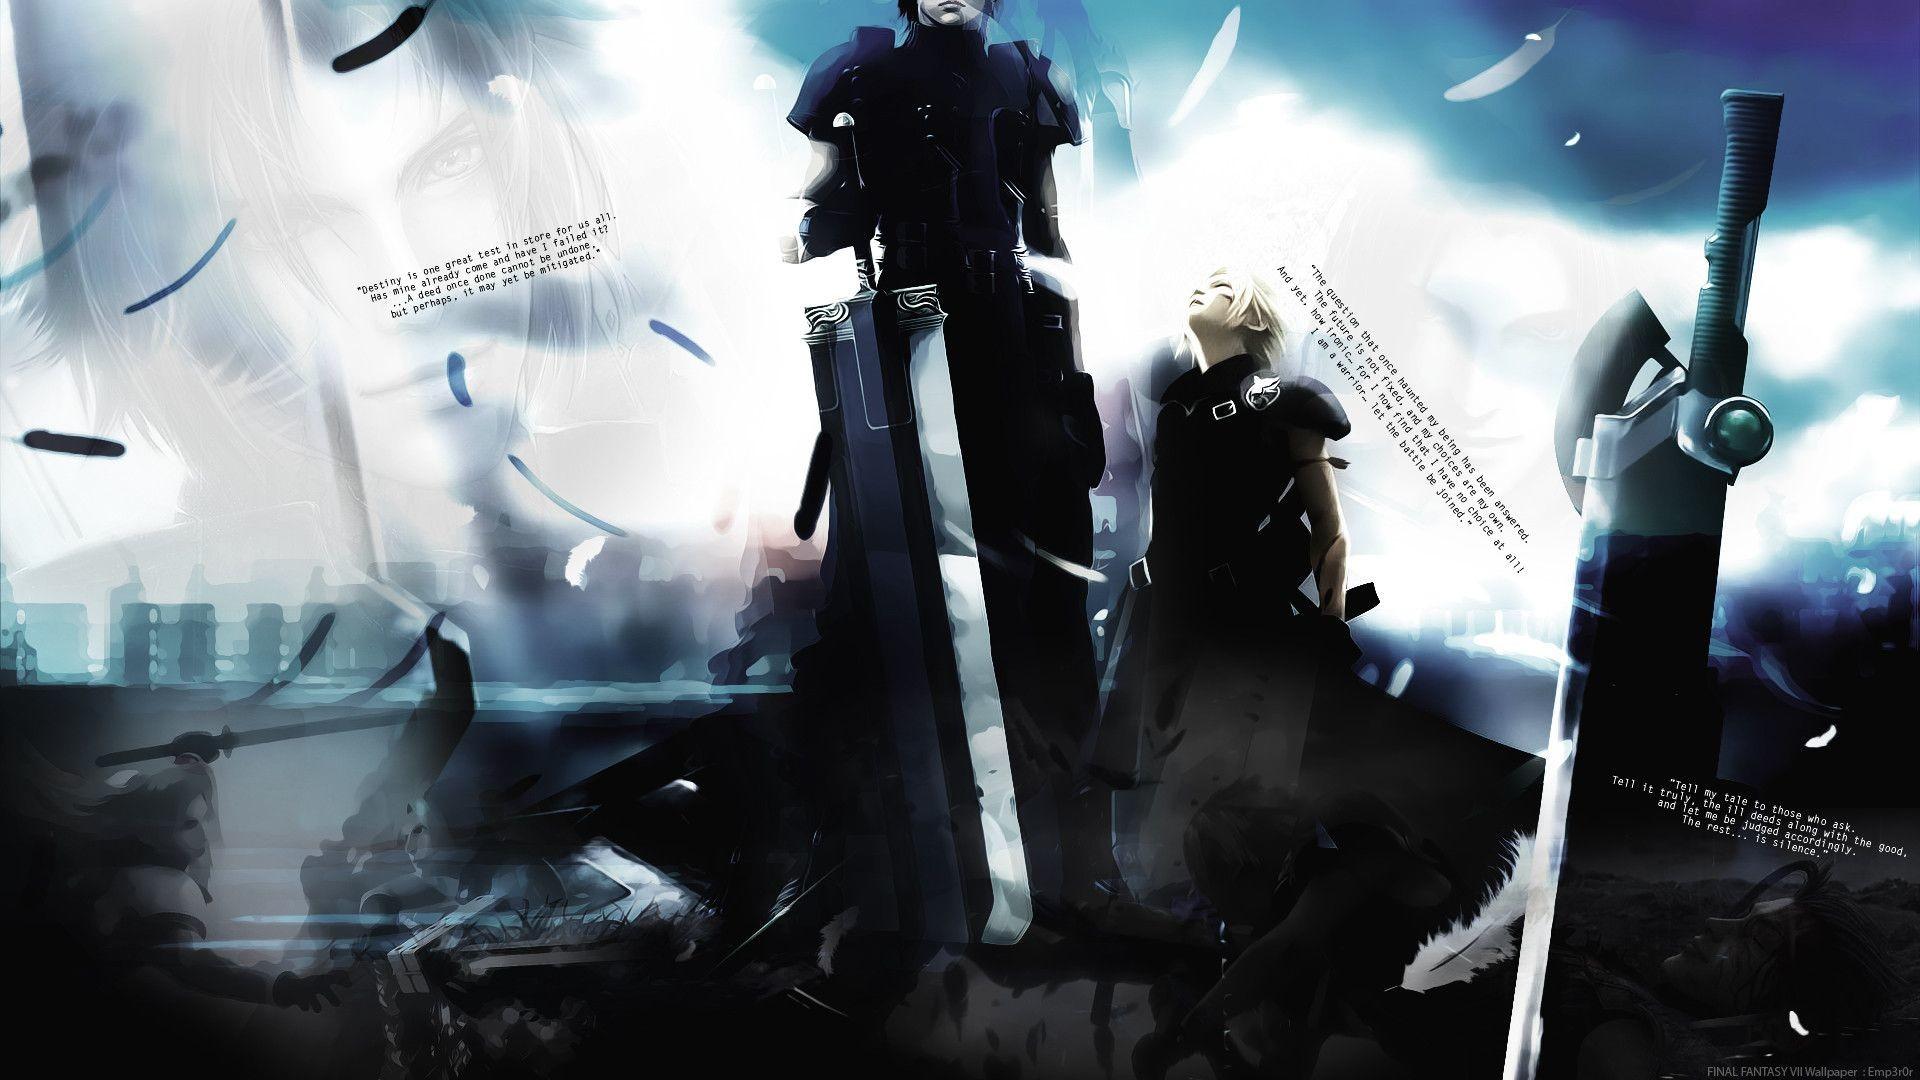 Final Fantasy PSP Wallpaper by DragonMash on DeviantArt | HD Wallpapers |  Pinterest | Final fantasy, Final fantasy cloud and Wallpaper